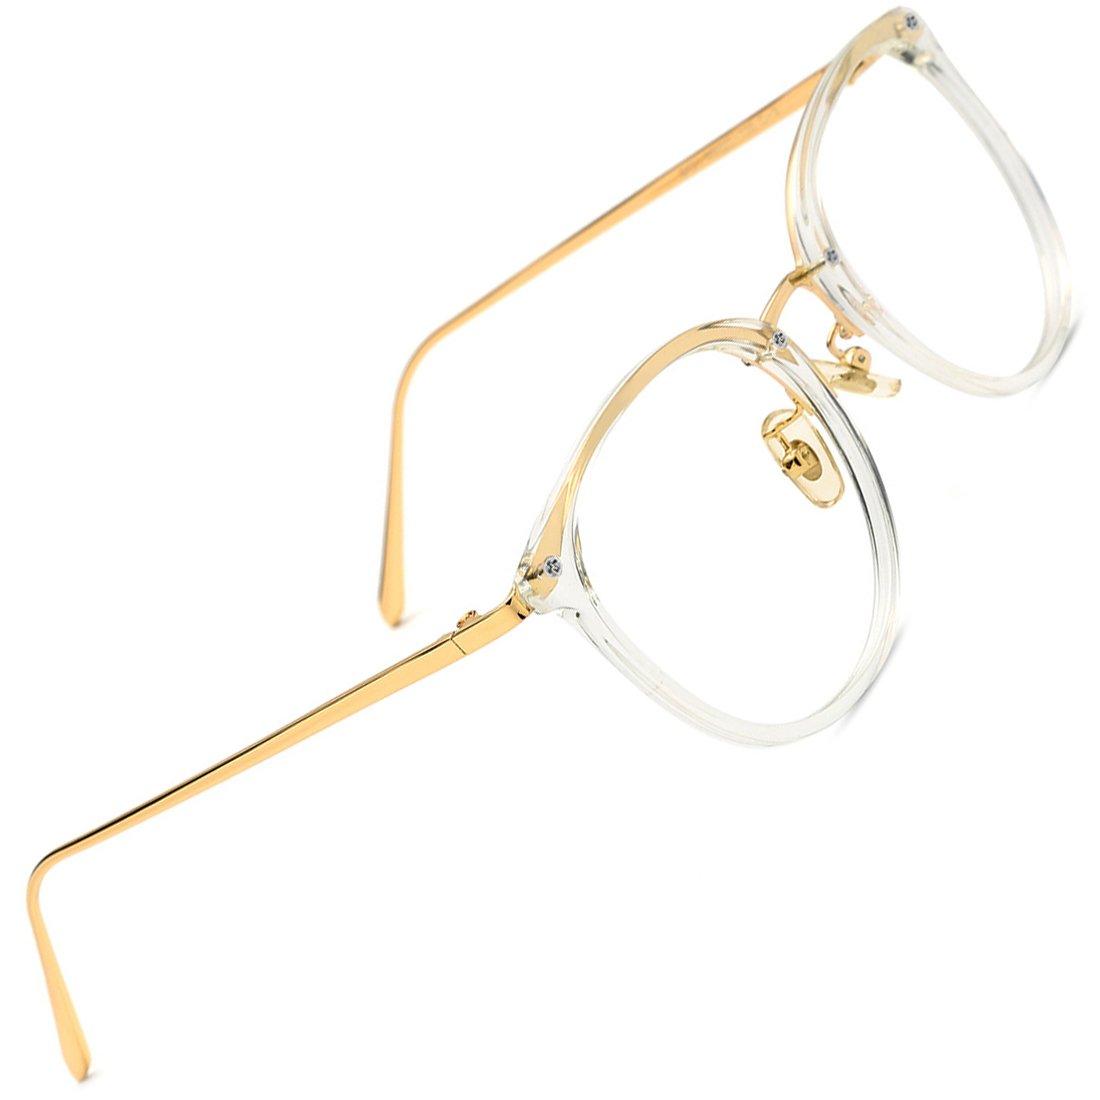 b83c69bdfd Lux Round Vintage Optical Eyewear Glasses Frame Gold White Fashion Design  Style